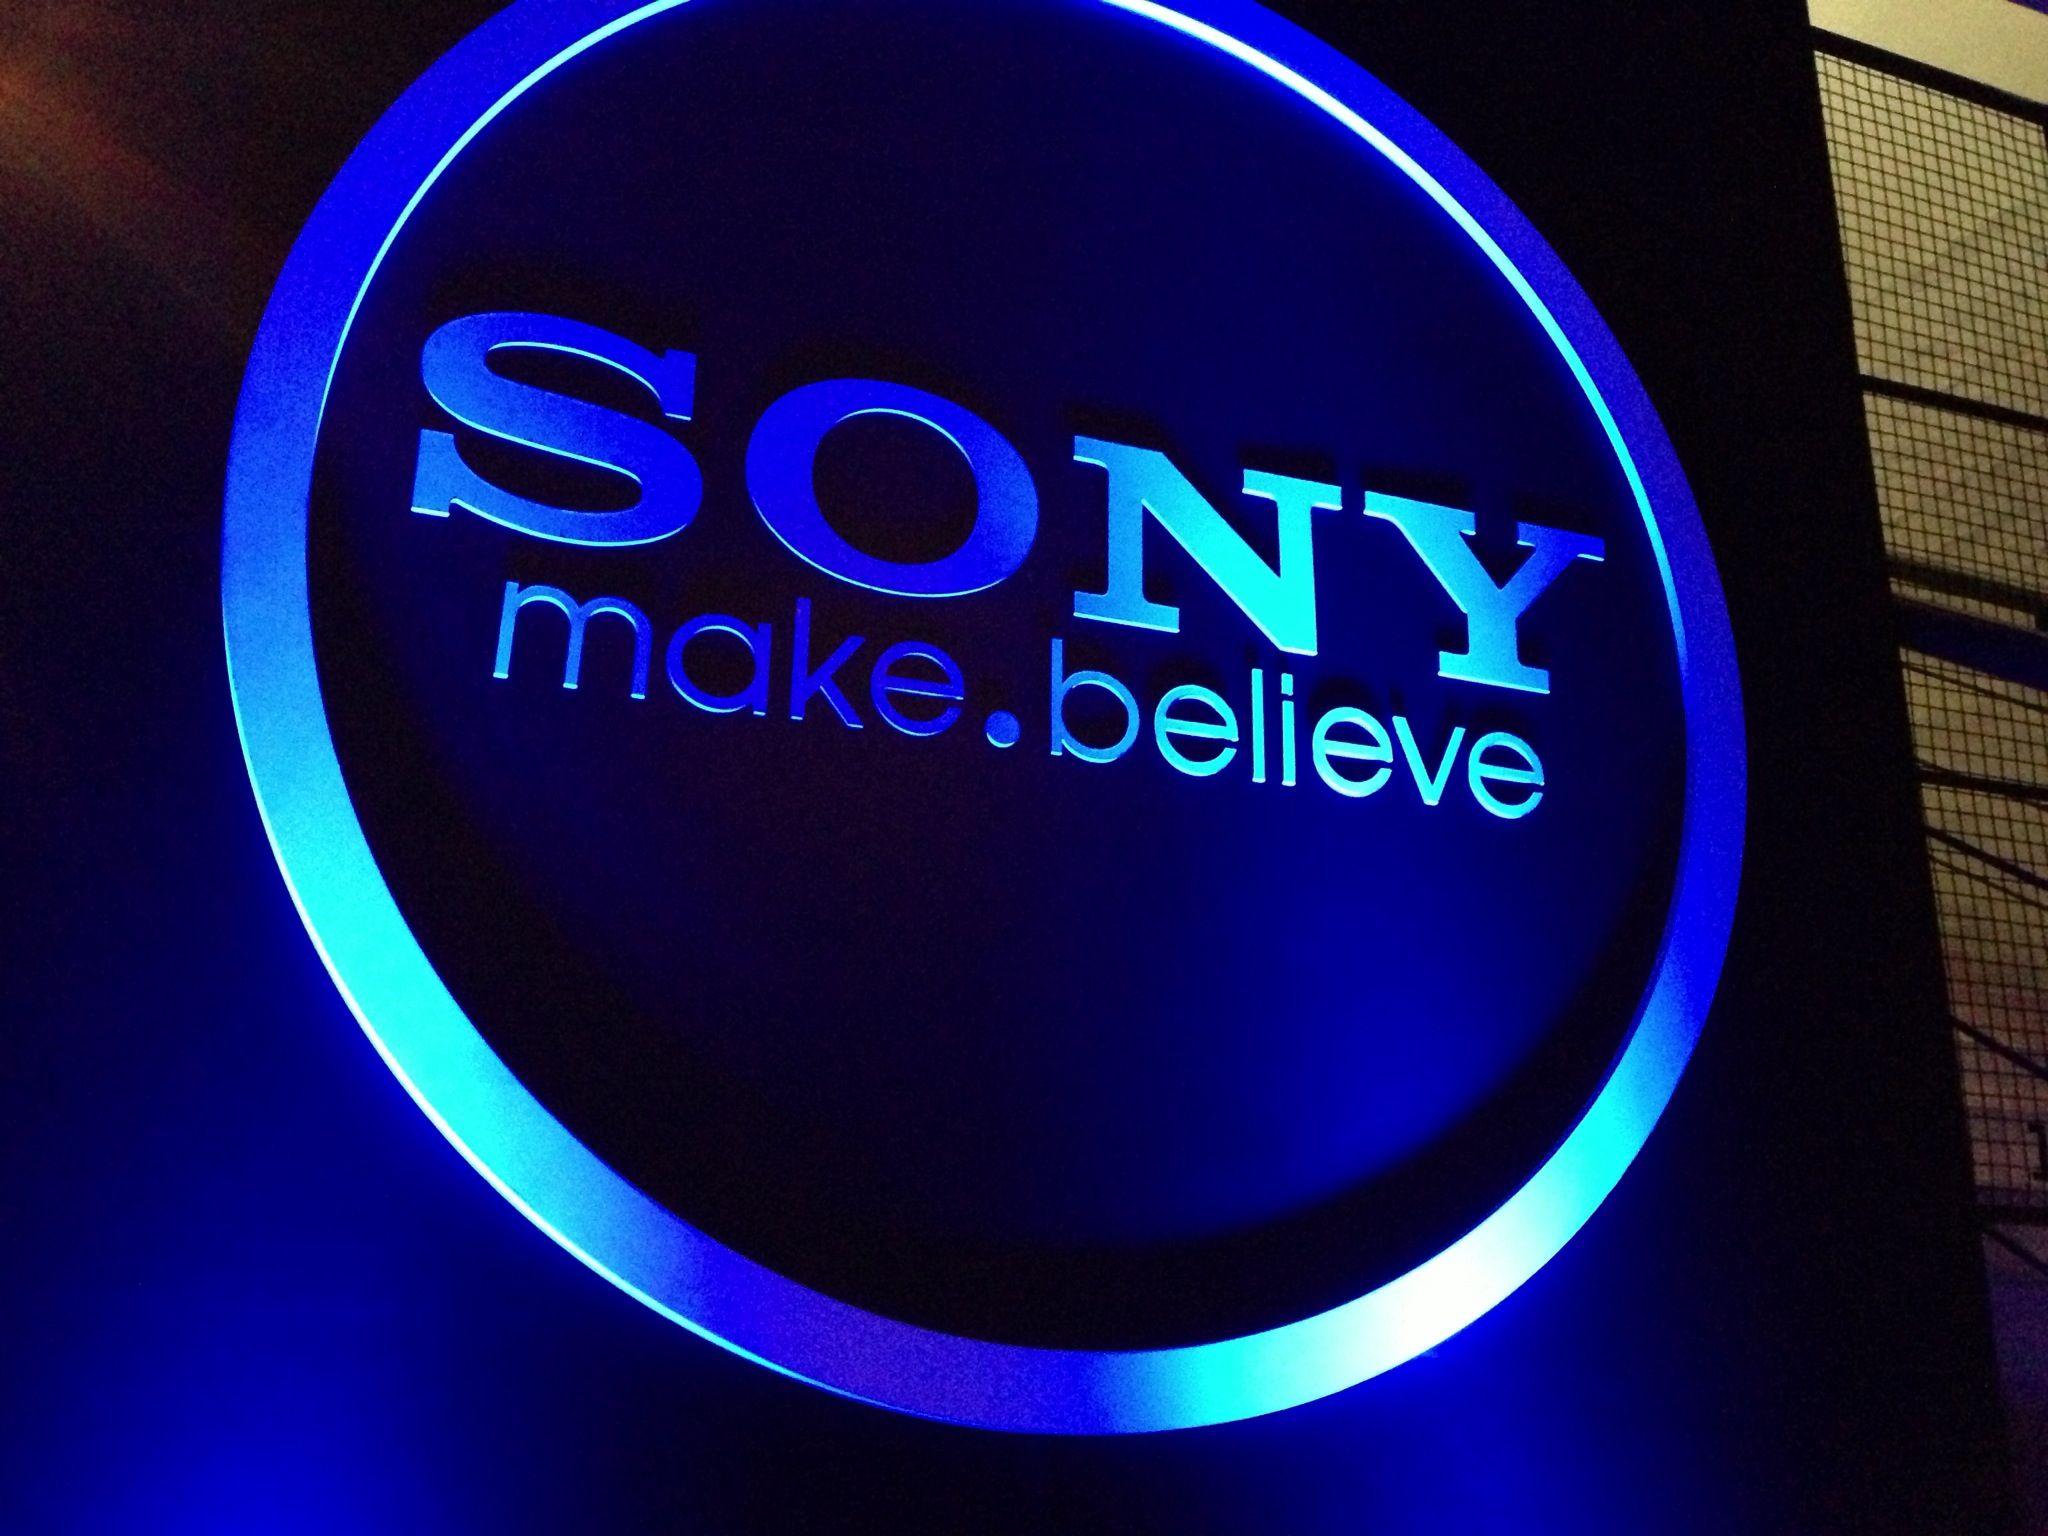 sony makebelieve logo sony pinterest sony and